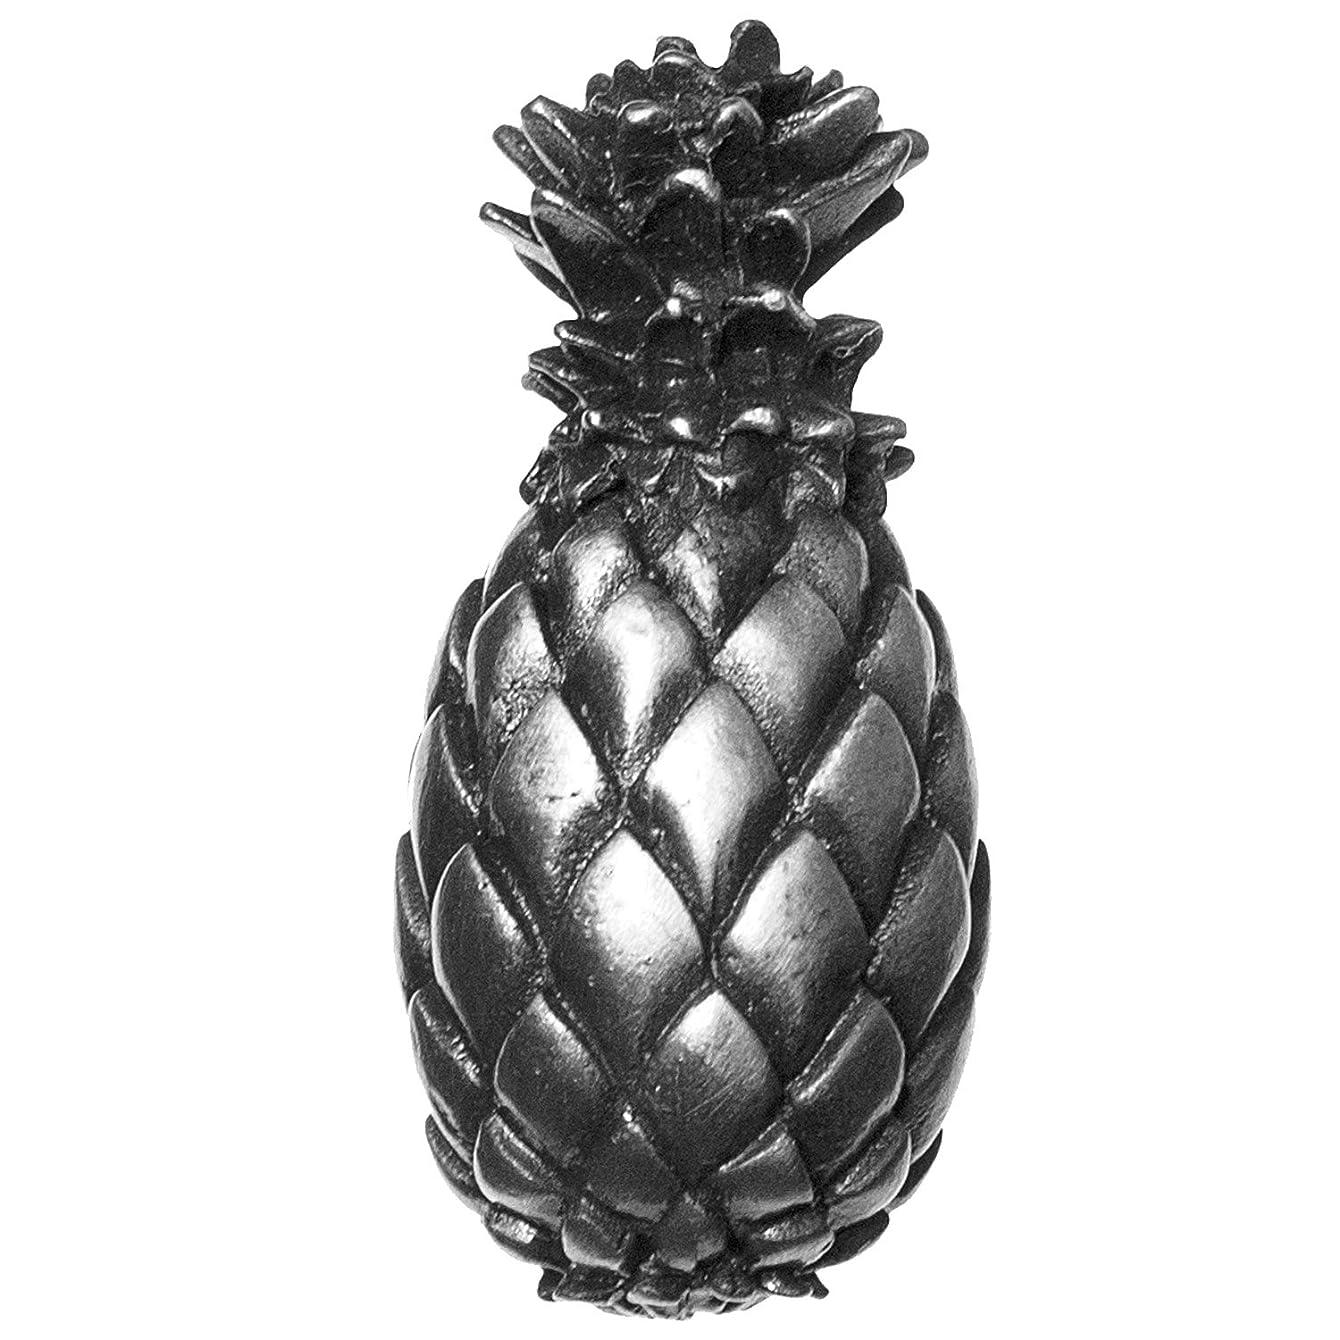 Big Sky Hardware Sierra Lifestyles Pineapple Knob, Pewter